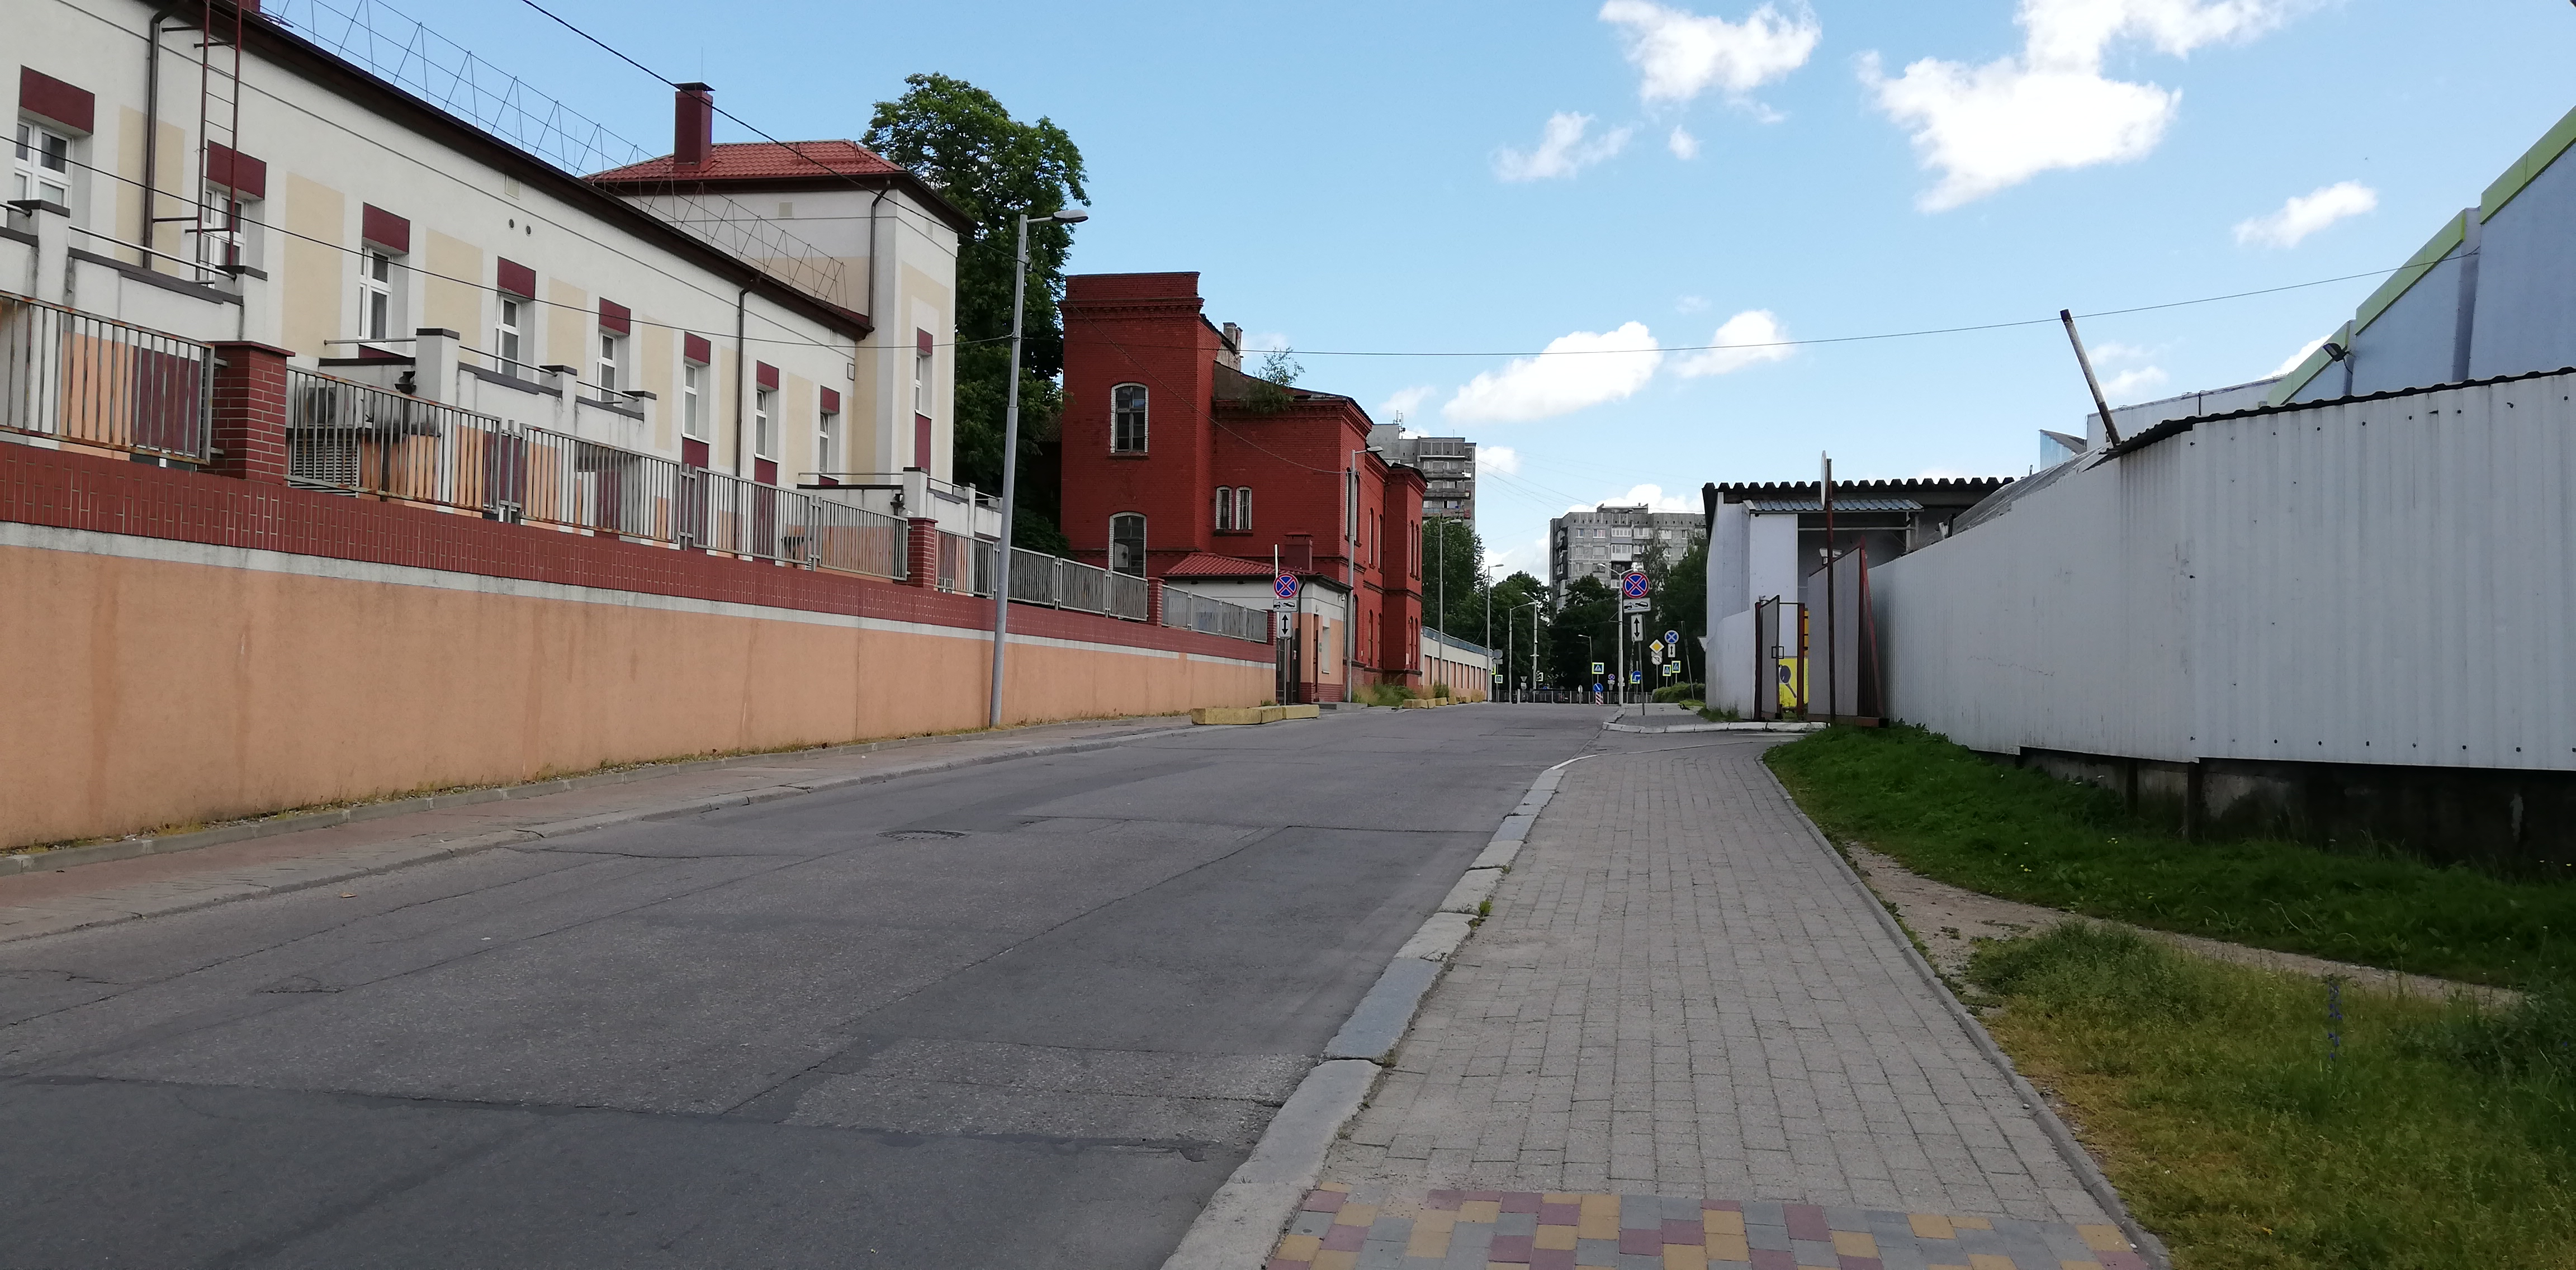 Russian Towns, Cities / Urban Development - Page 6 Img_20210613_163438-jpg